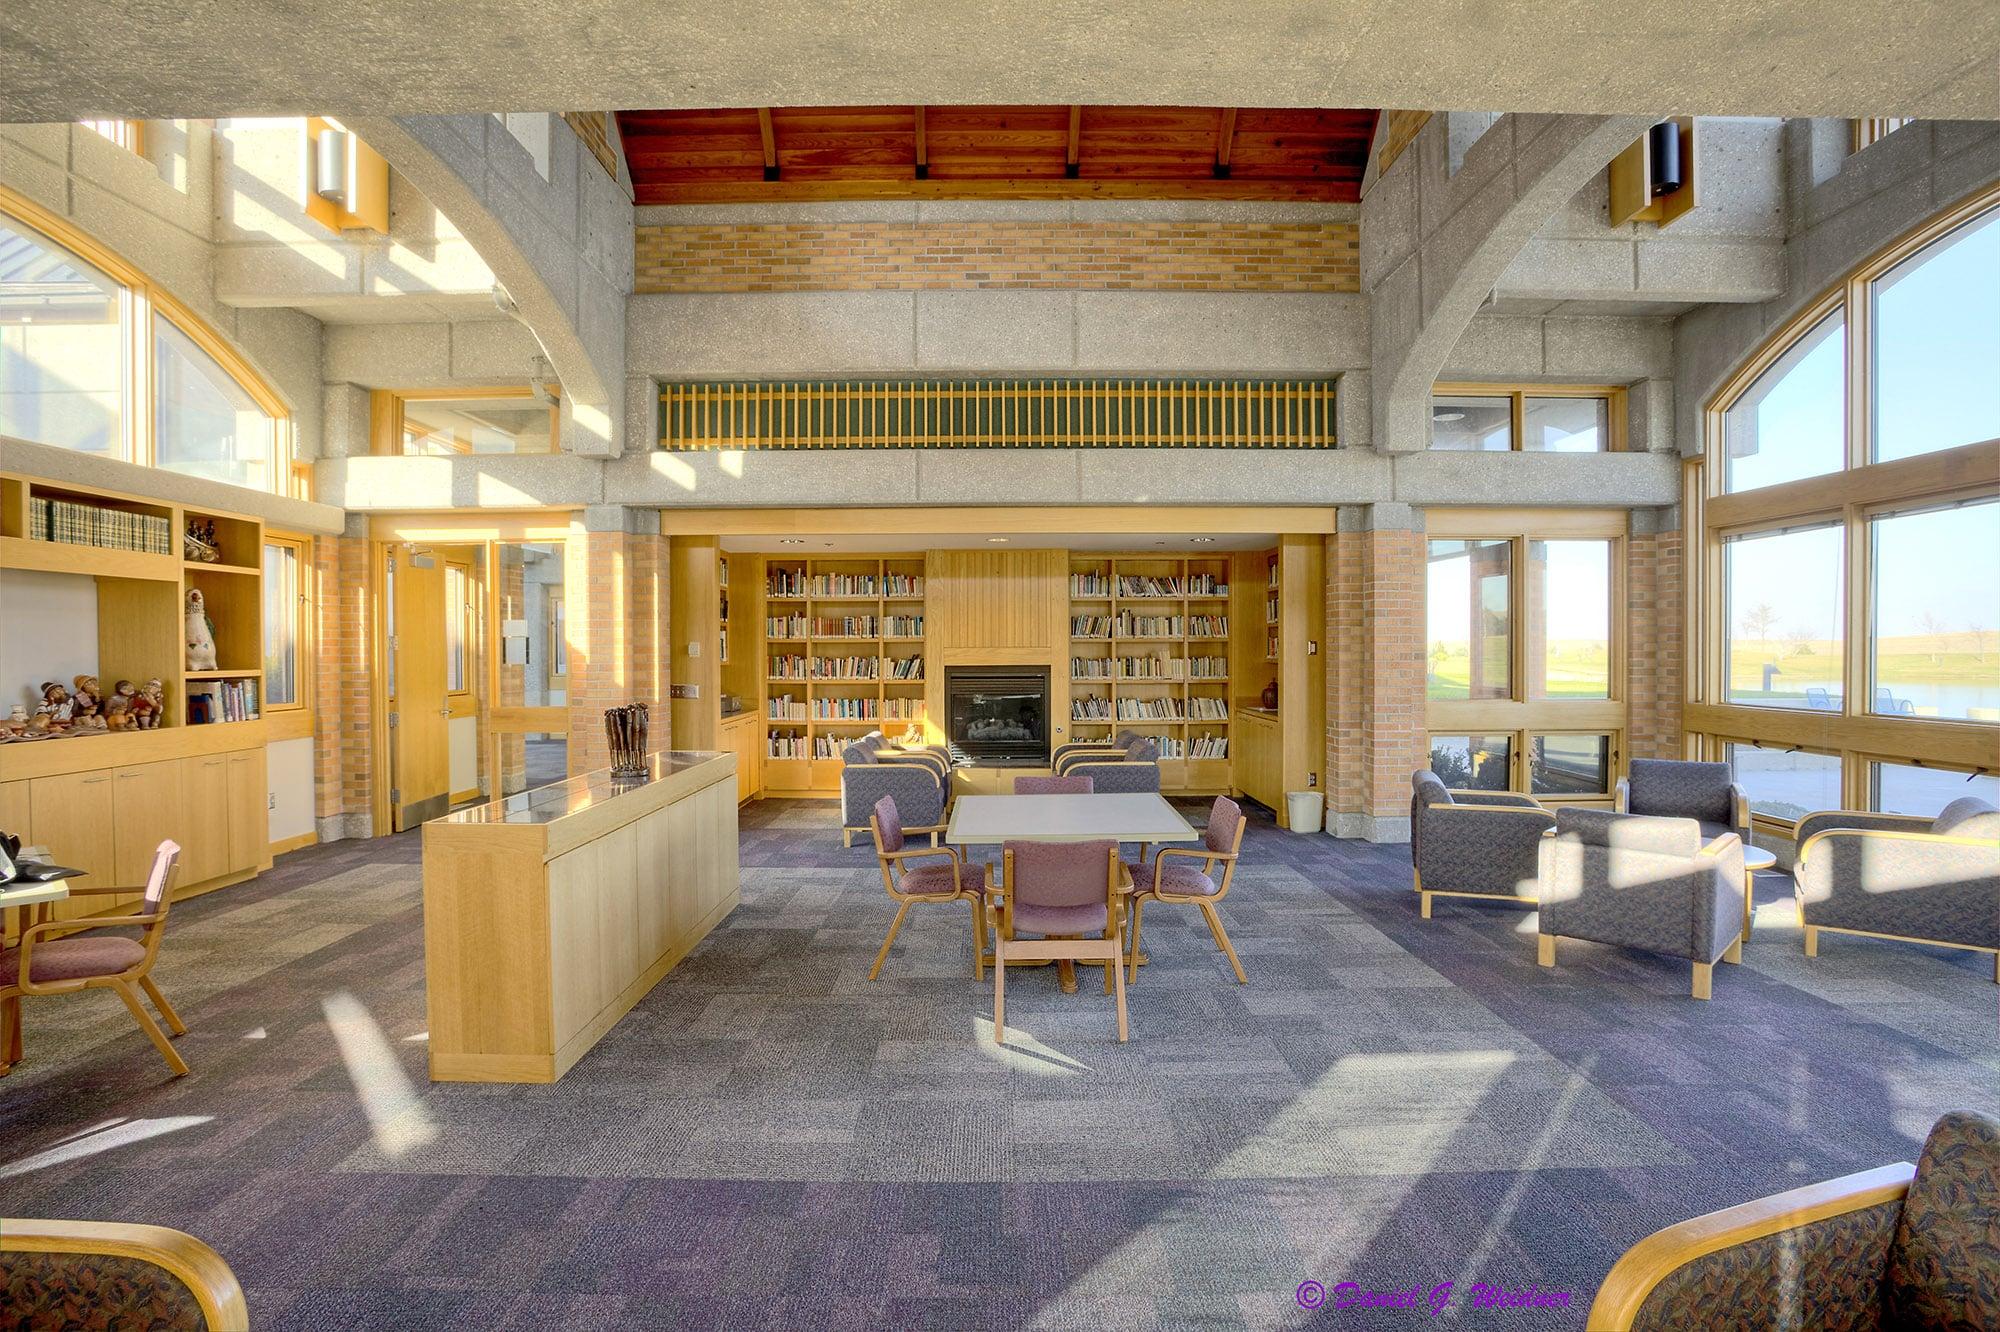 Interior_SBC_1.jpg